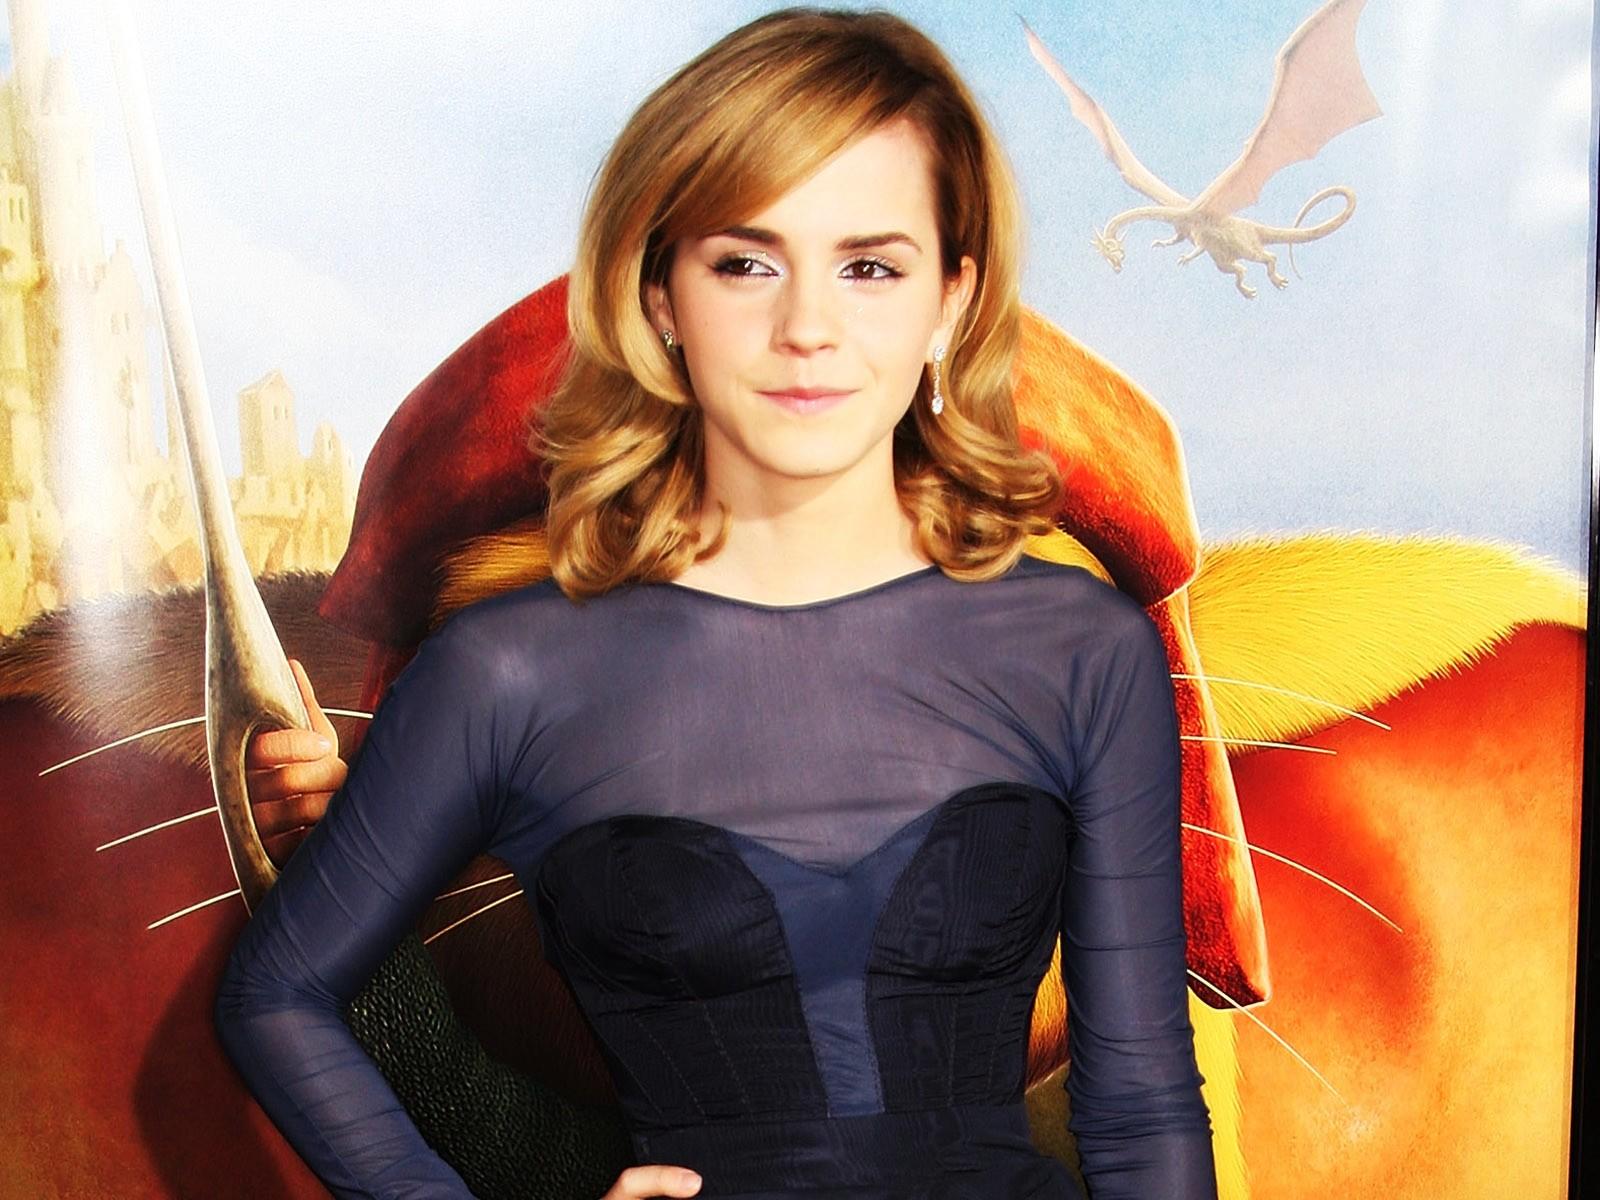 Cute Cute Hd Wallpapers Best Pics Store Emma Watson Cute Hd Wallpaper Collection